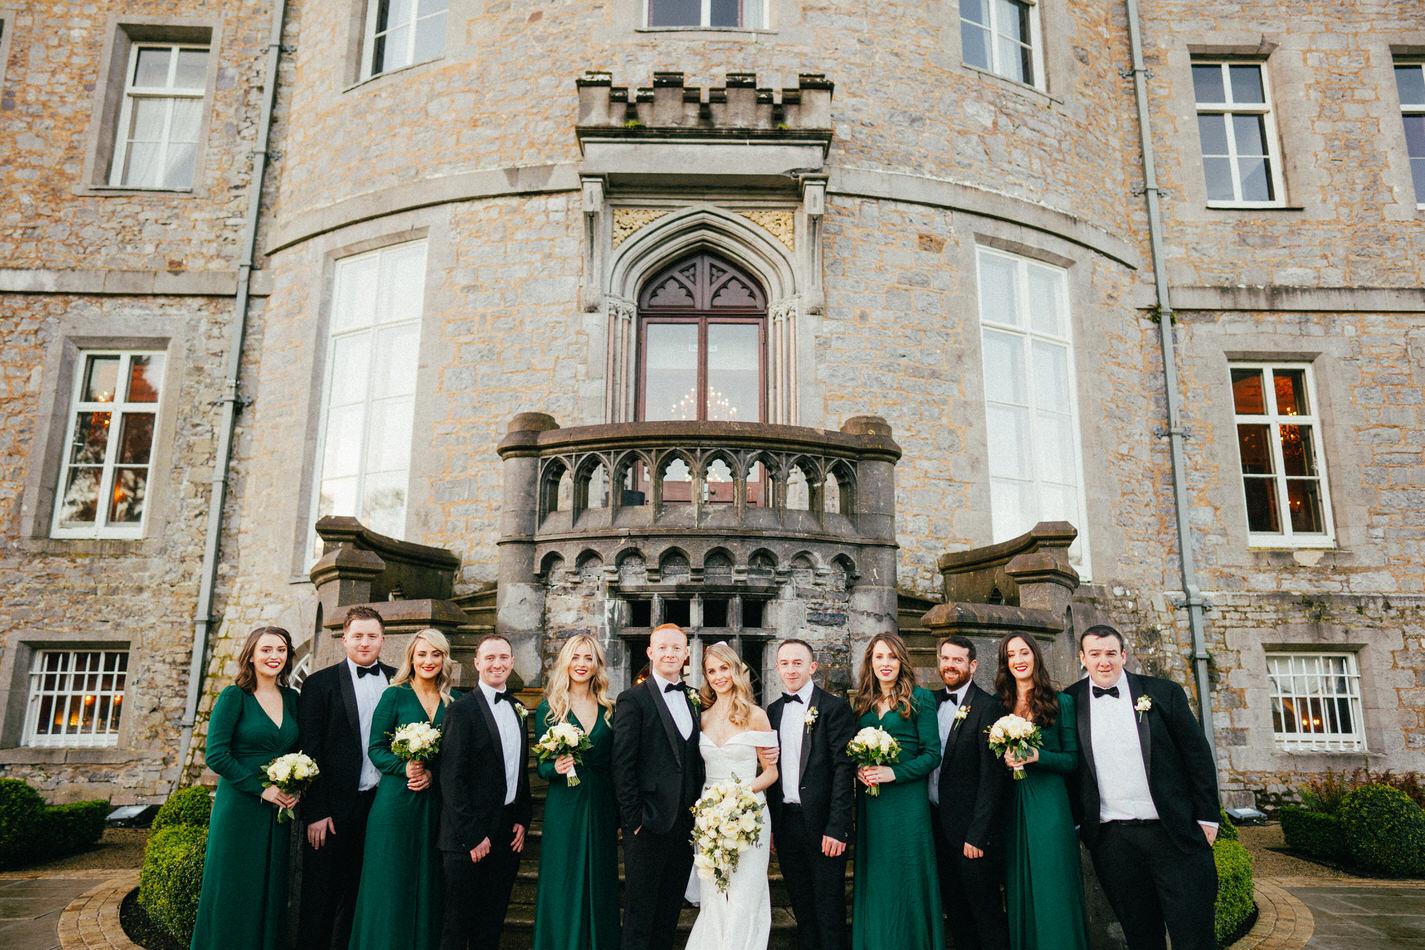 Castle-wedding-ireland-photos- 0216 156